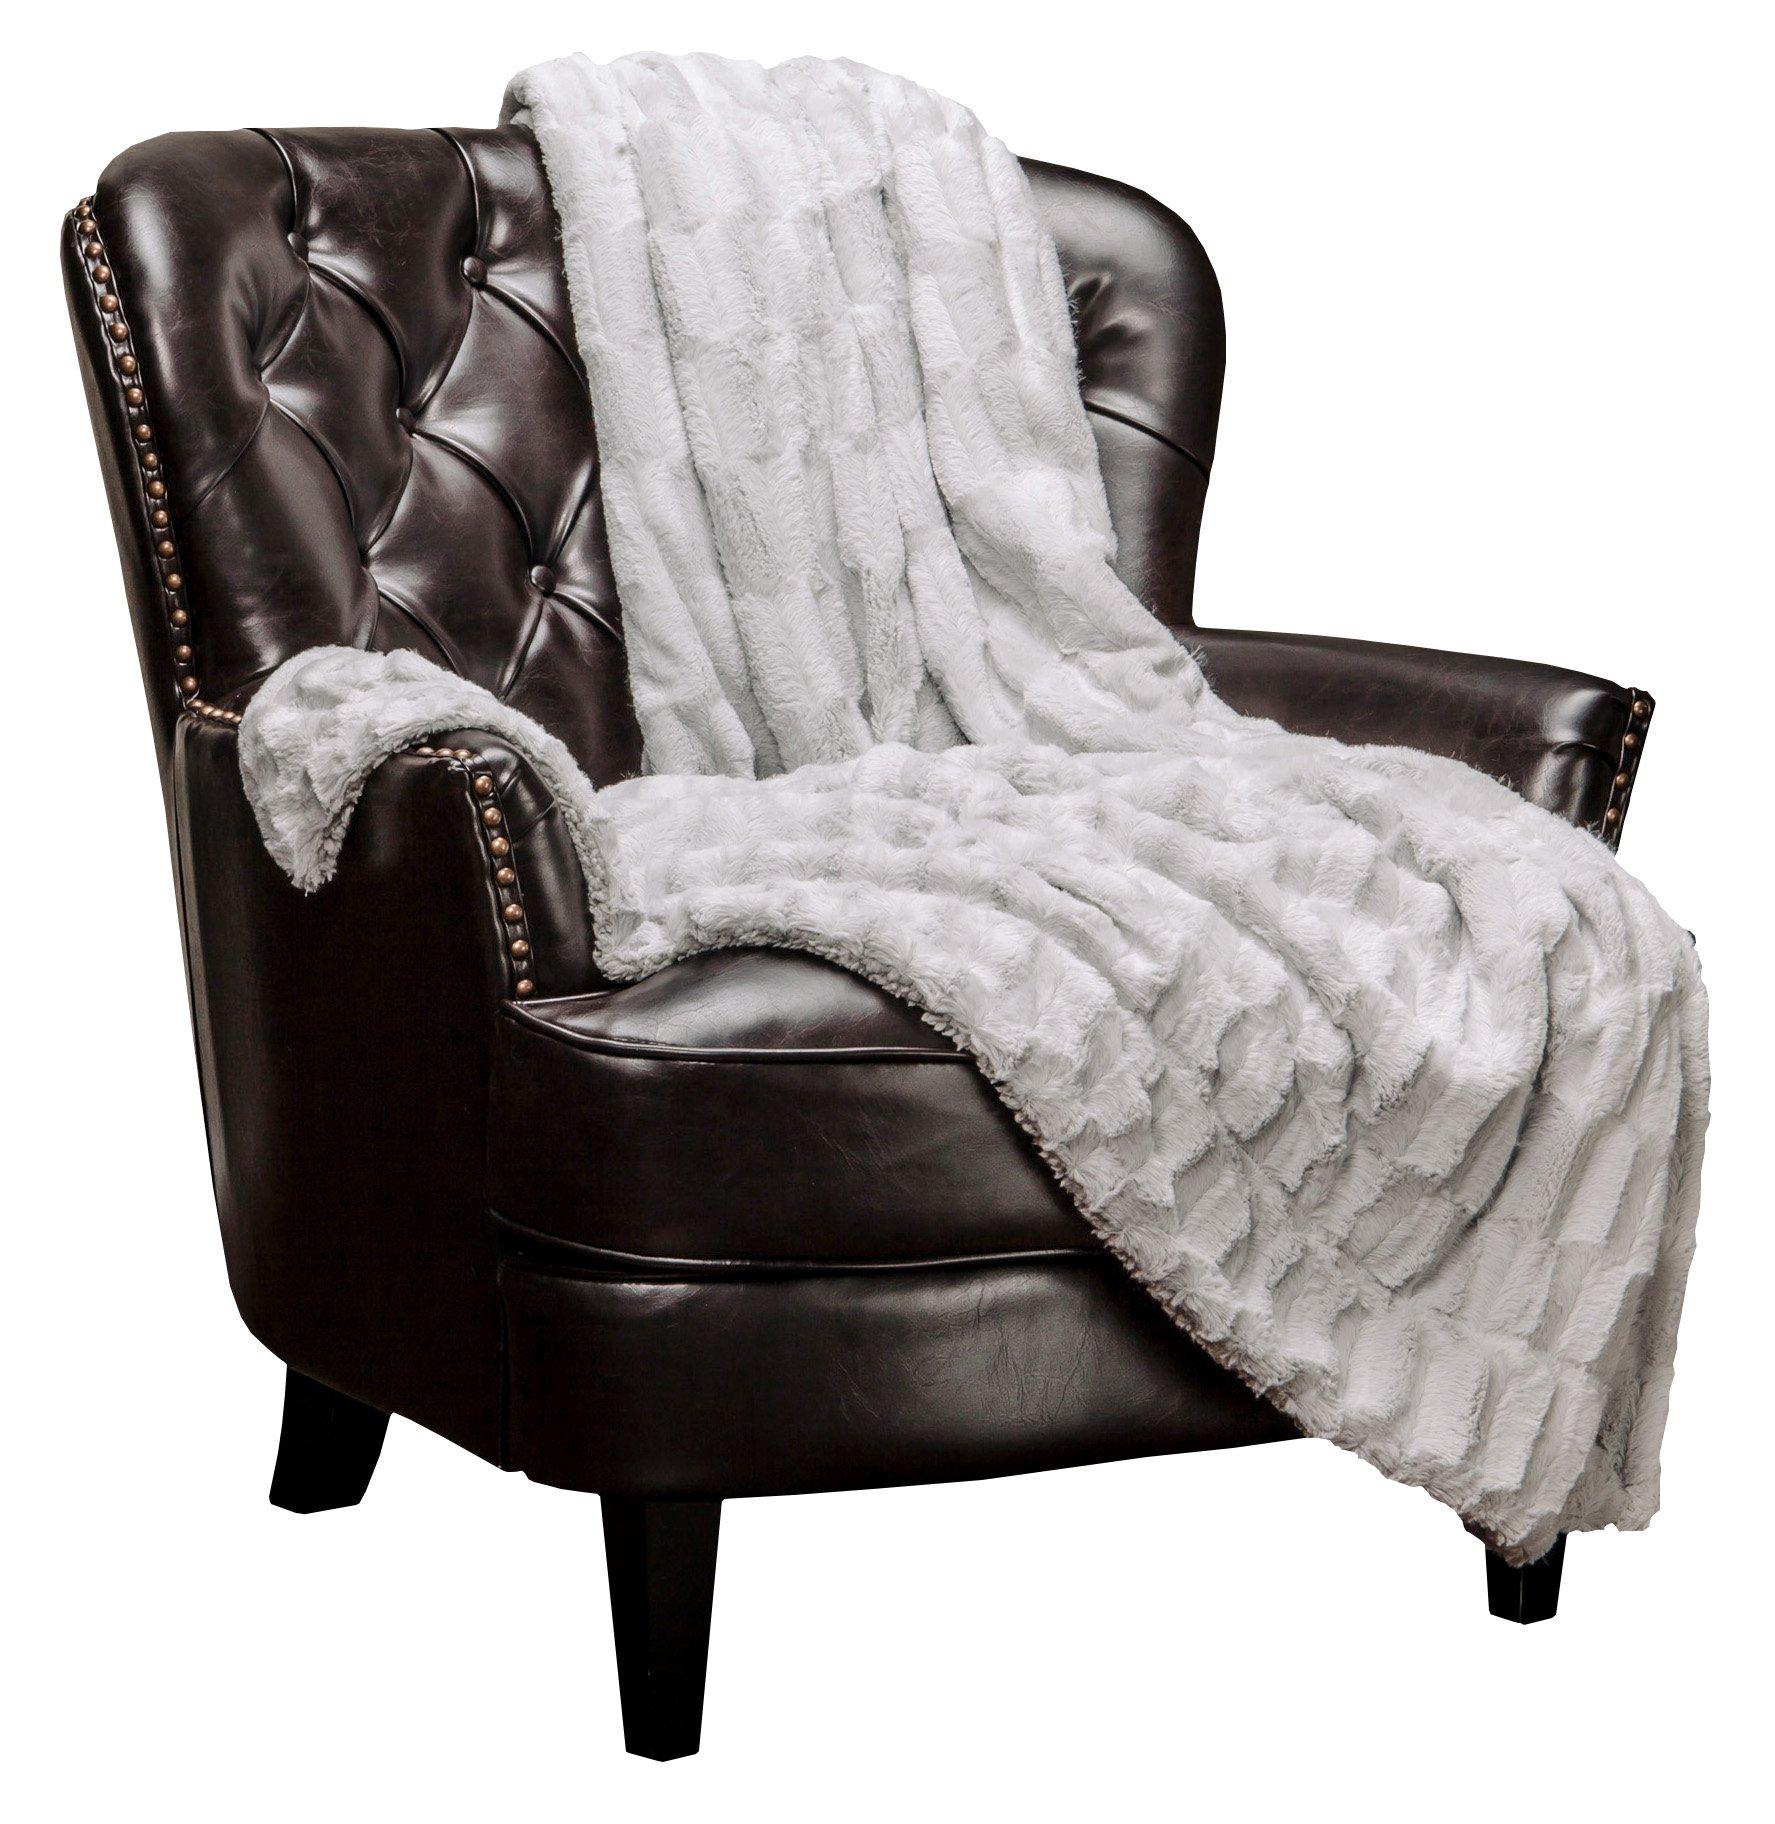 Chanasya Super Soft Fuzzy Faux Fur Elegant Rectangular Embossed Throw Blanket | Fluffy Plush Sherpa Cream Microfiber Silver Blanket for Bed Couch Living Room Fall Winter Spring (50'' x 65'') - LightGrey